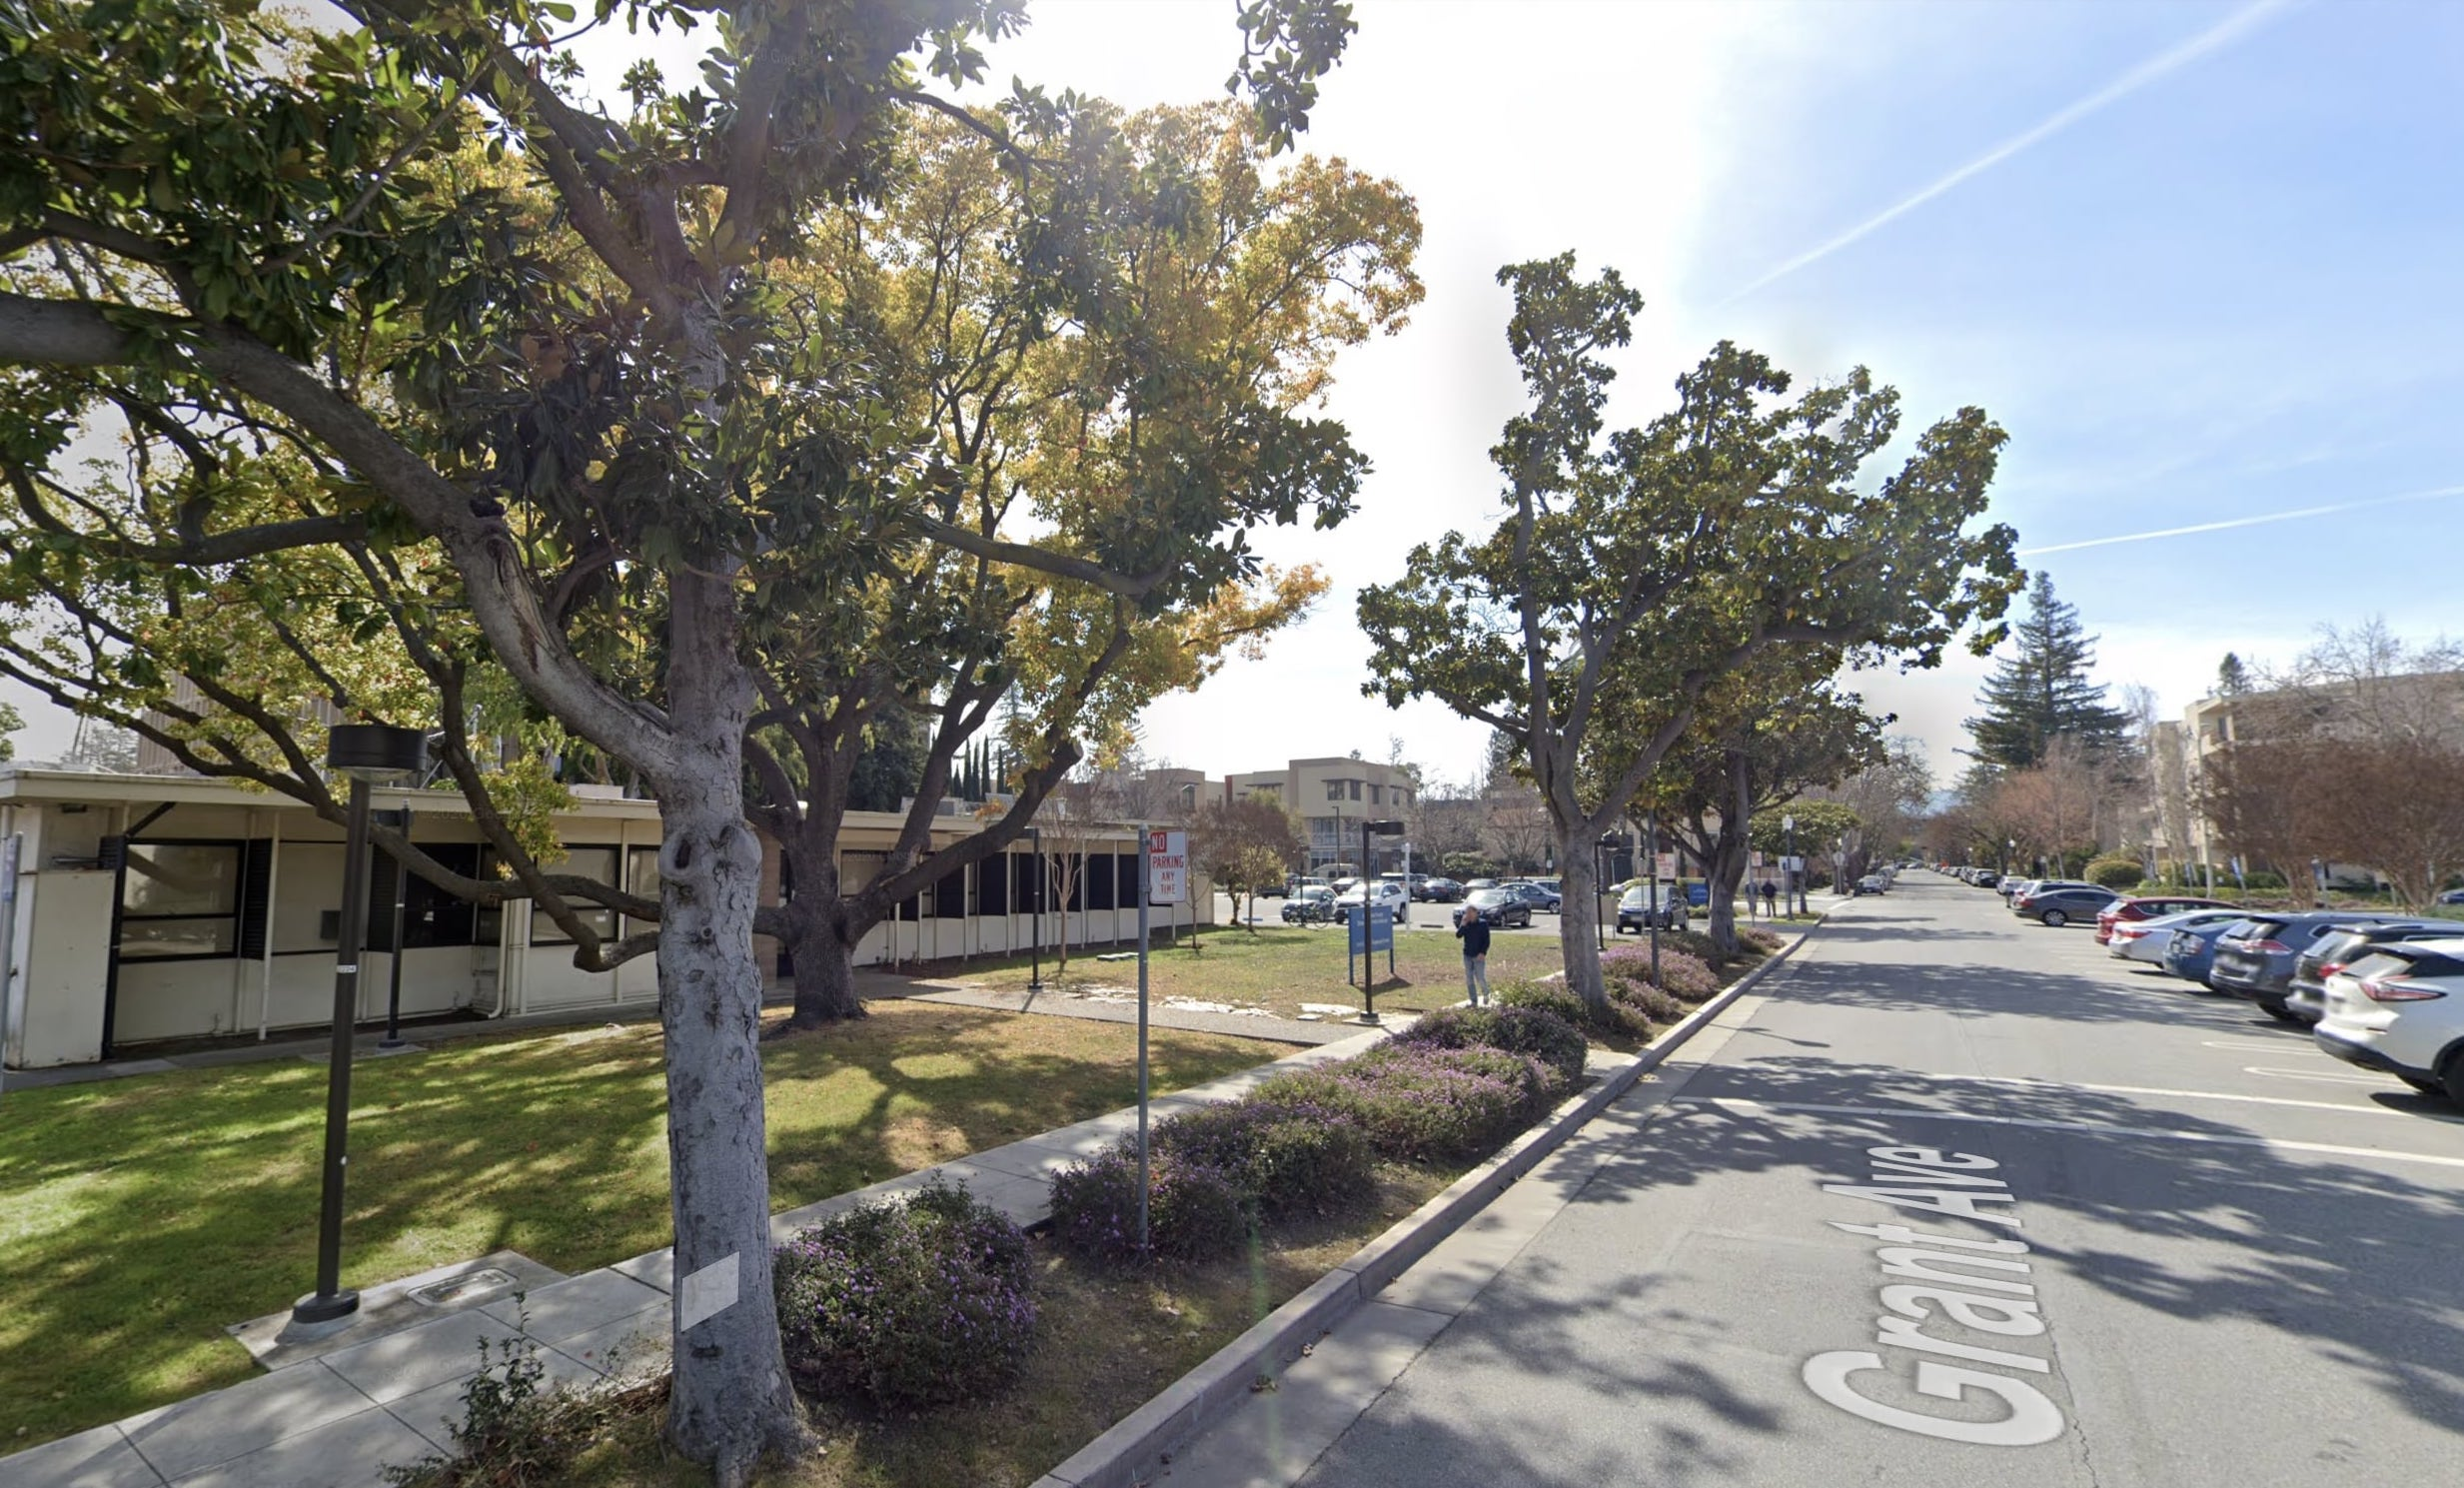 231 Grant Avenue, image via Google Street View